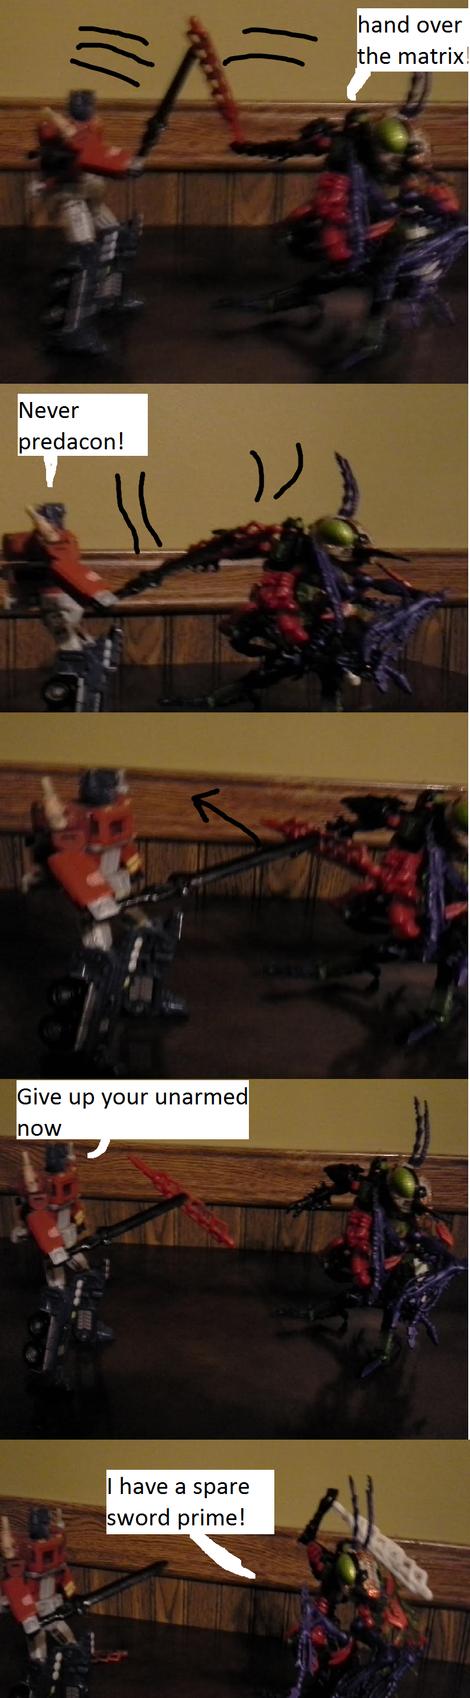 Optimus prime  vs Predacon Scourage by imyouknowwho